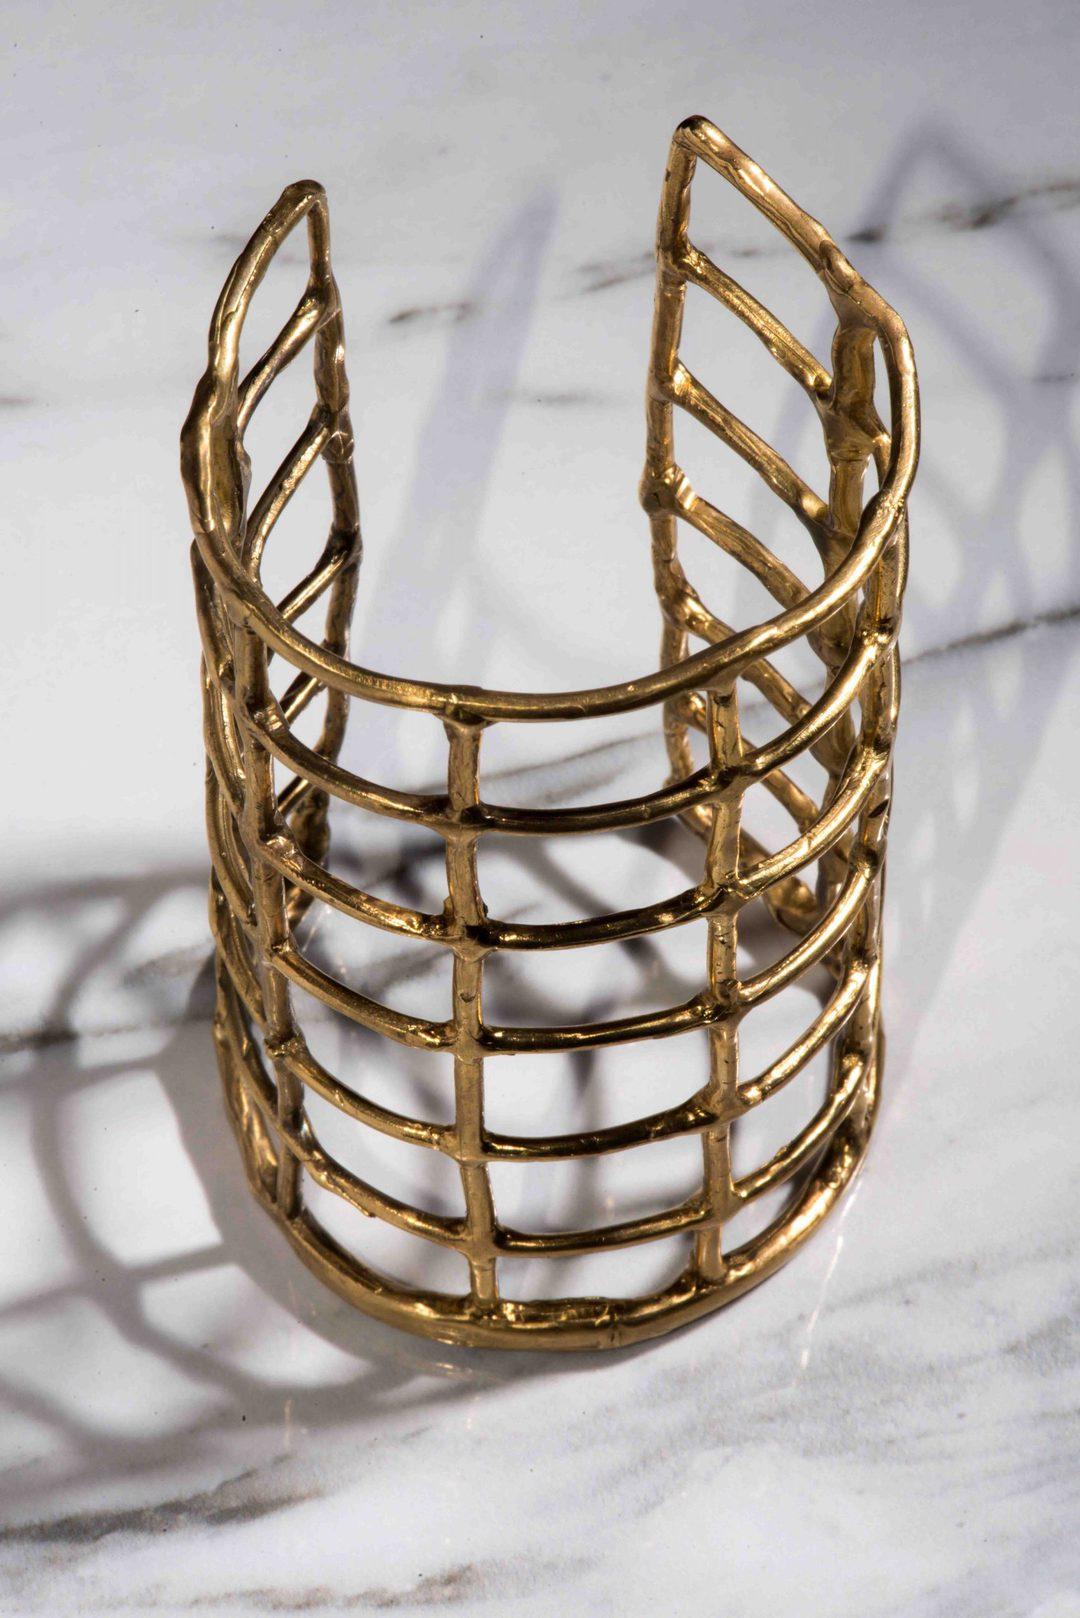 The Bow Jewelry Hypatia001430